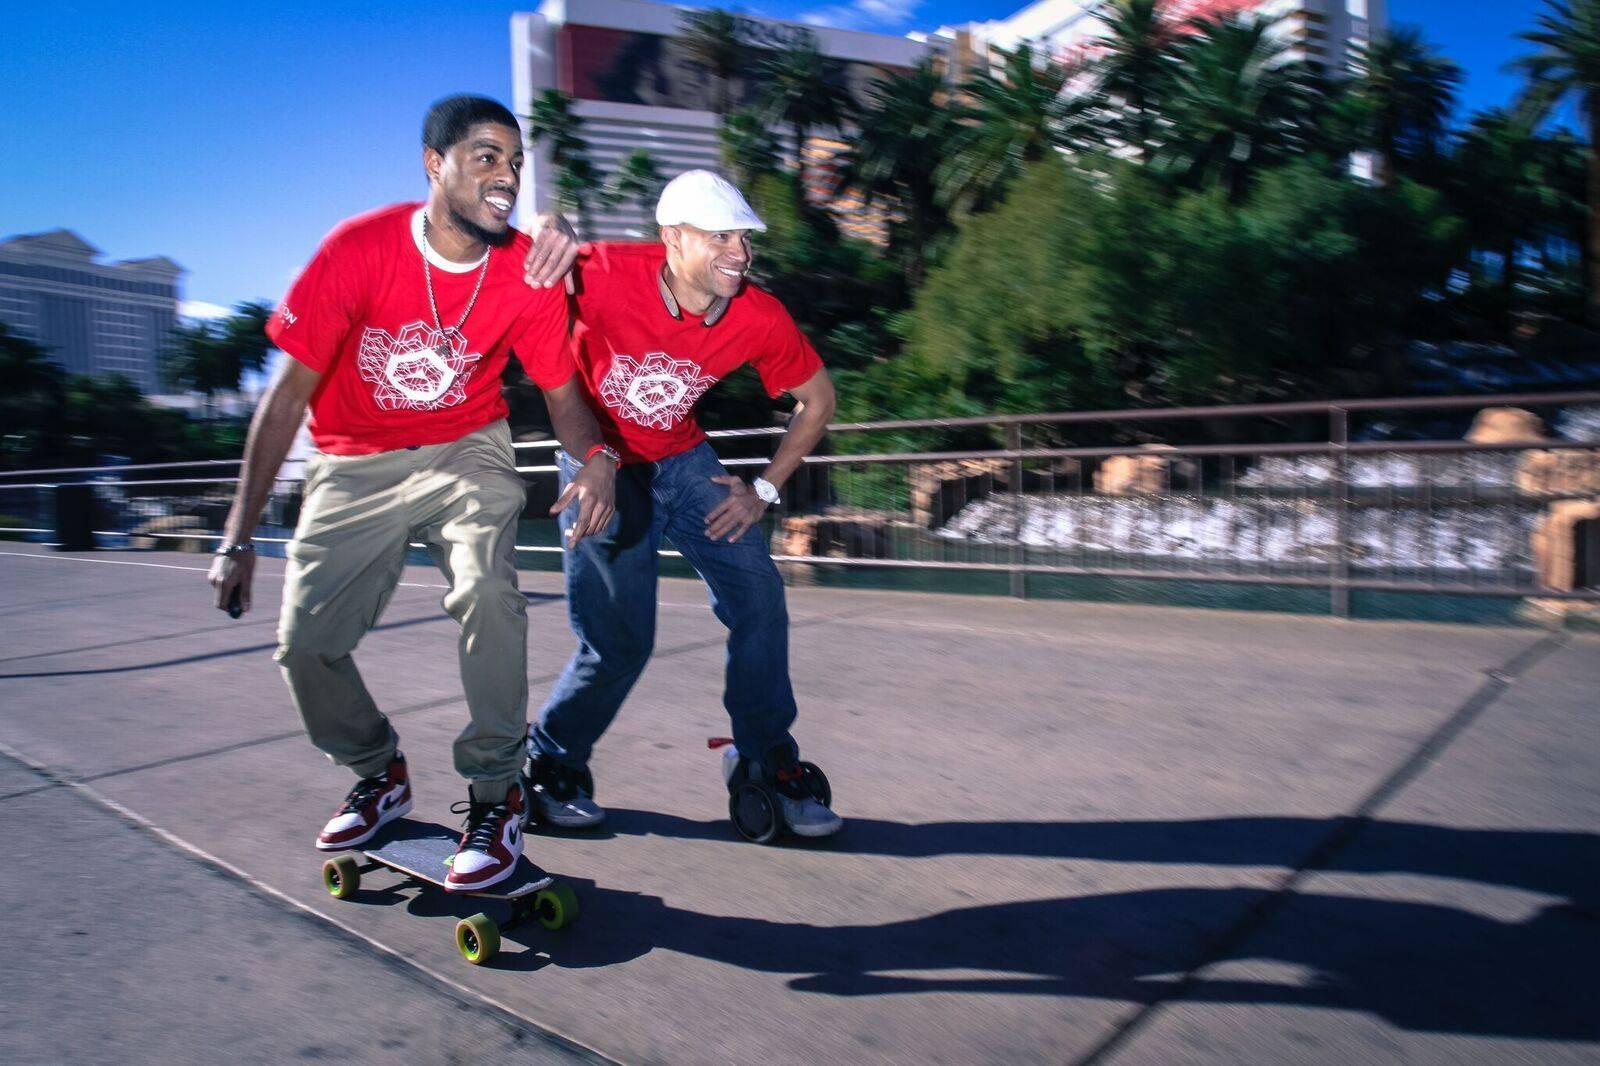 Rocket Skates kopen tips